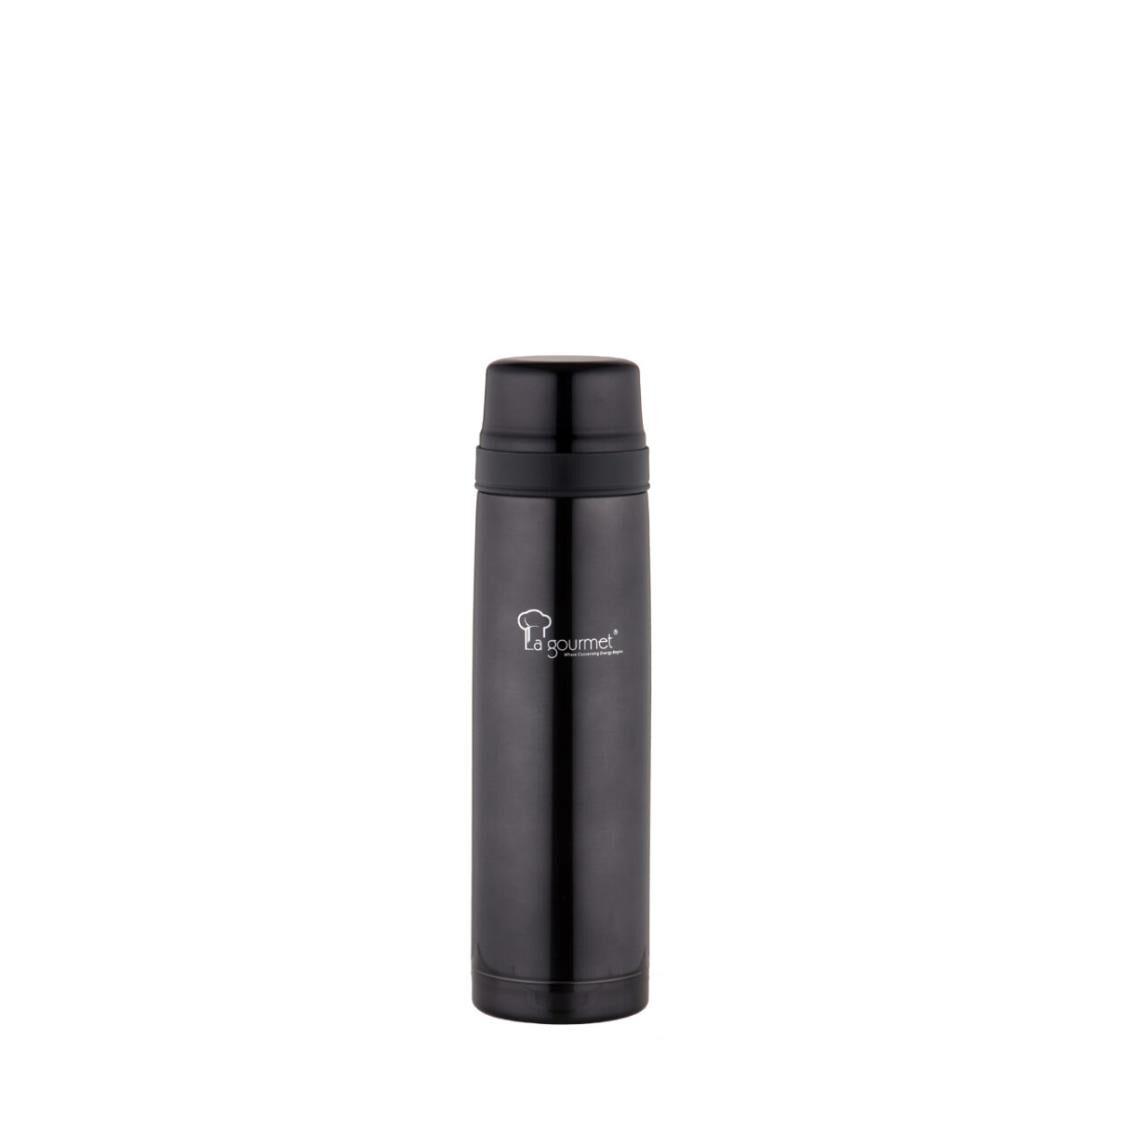 La Gourmet Amber 1L Thermal Flask Black LGTA327222